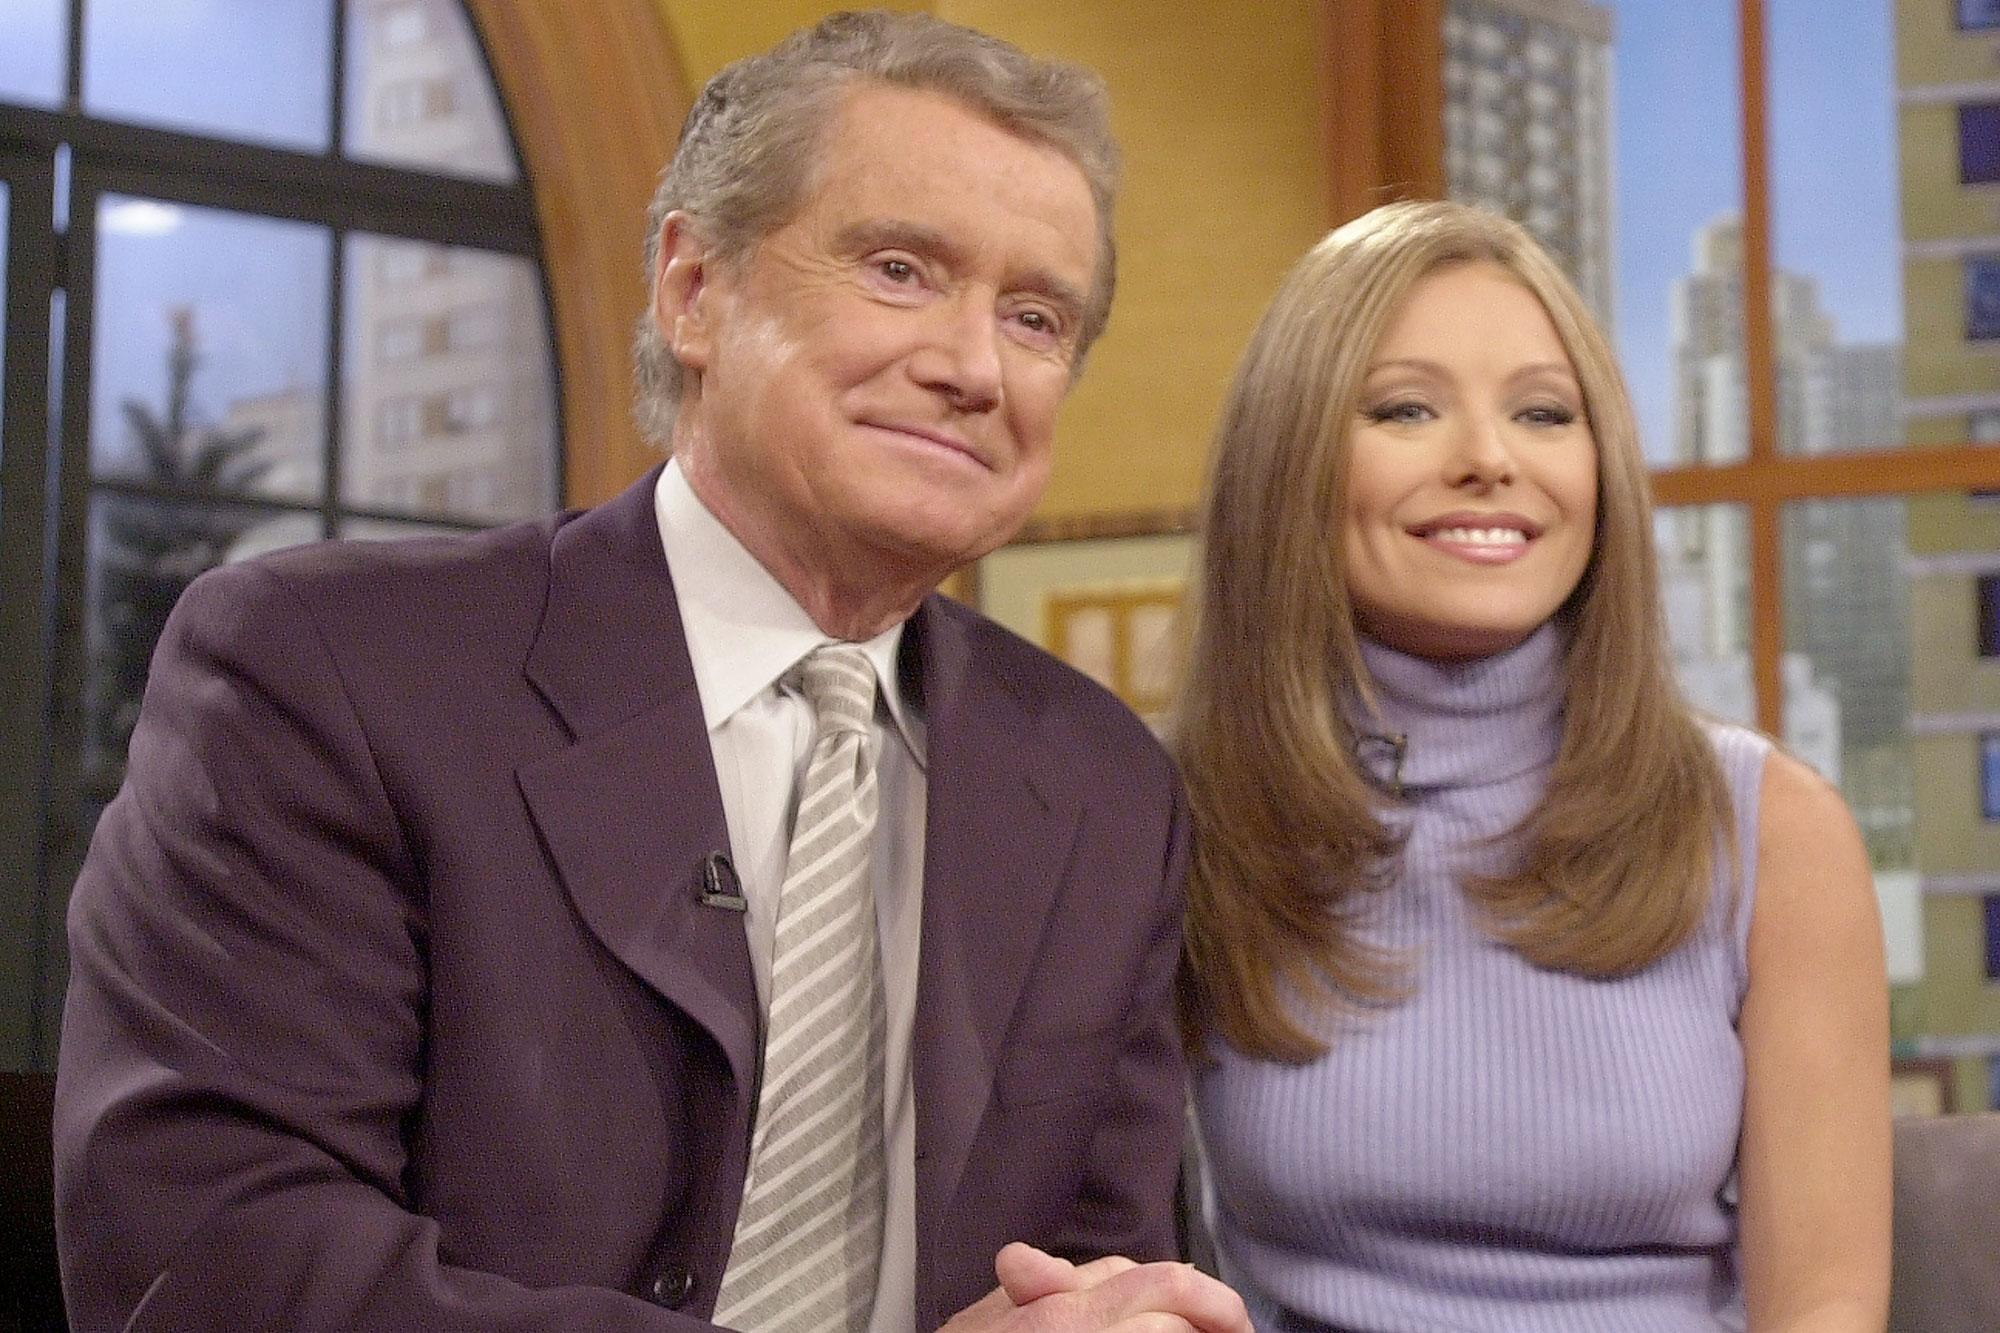 Regis and Kelly